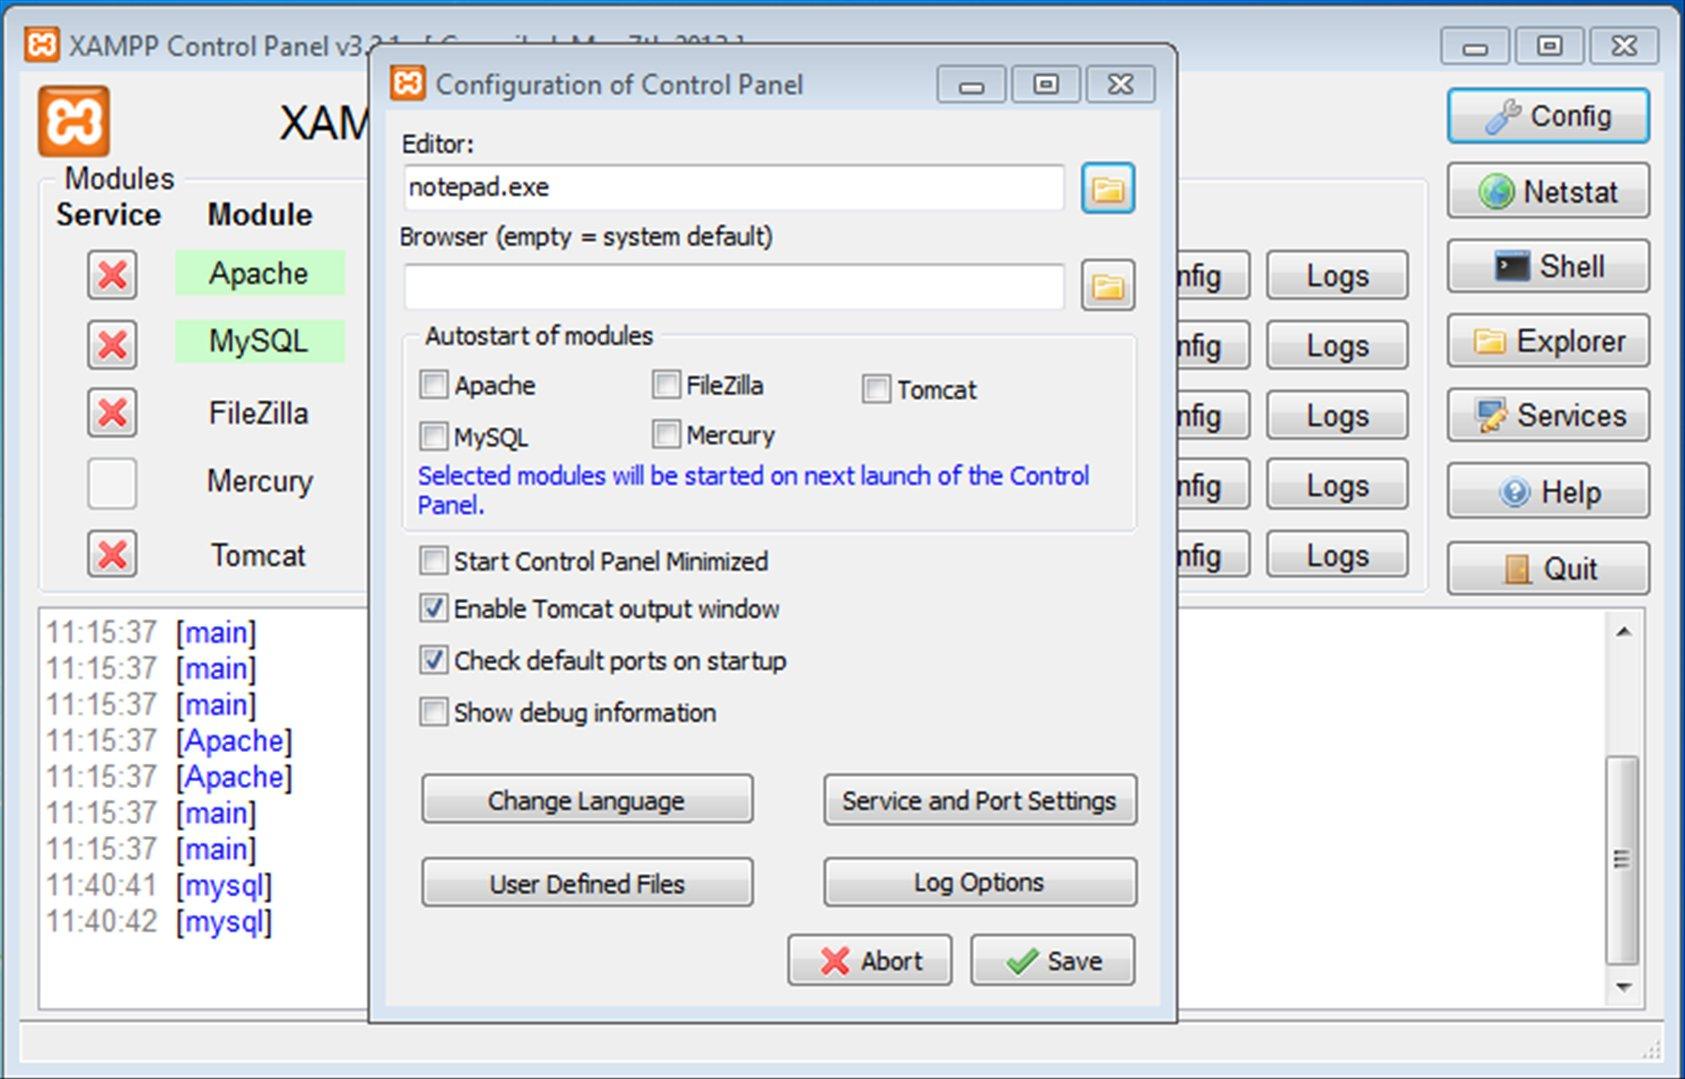 XAMPP 7.4.9.0